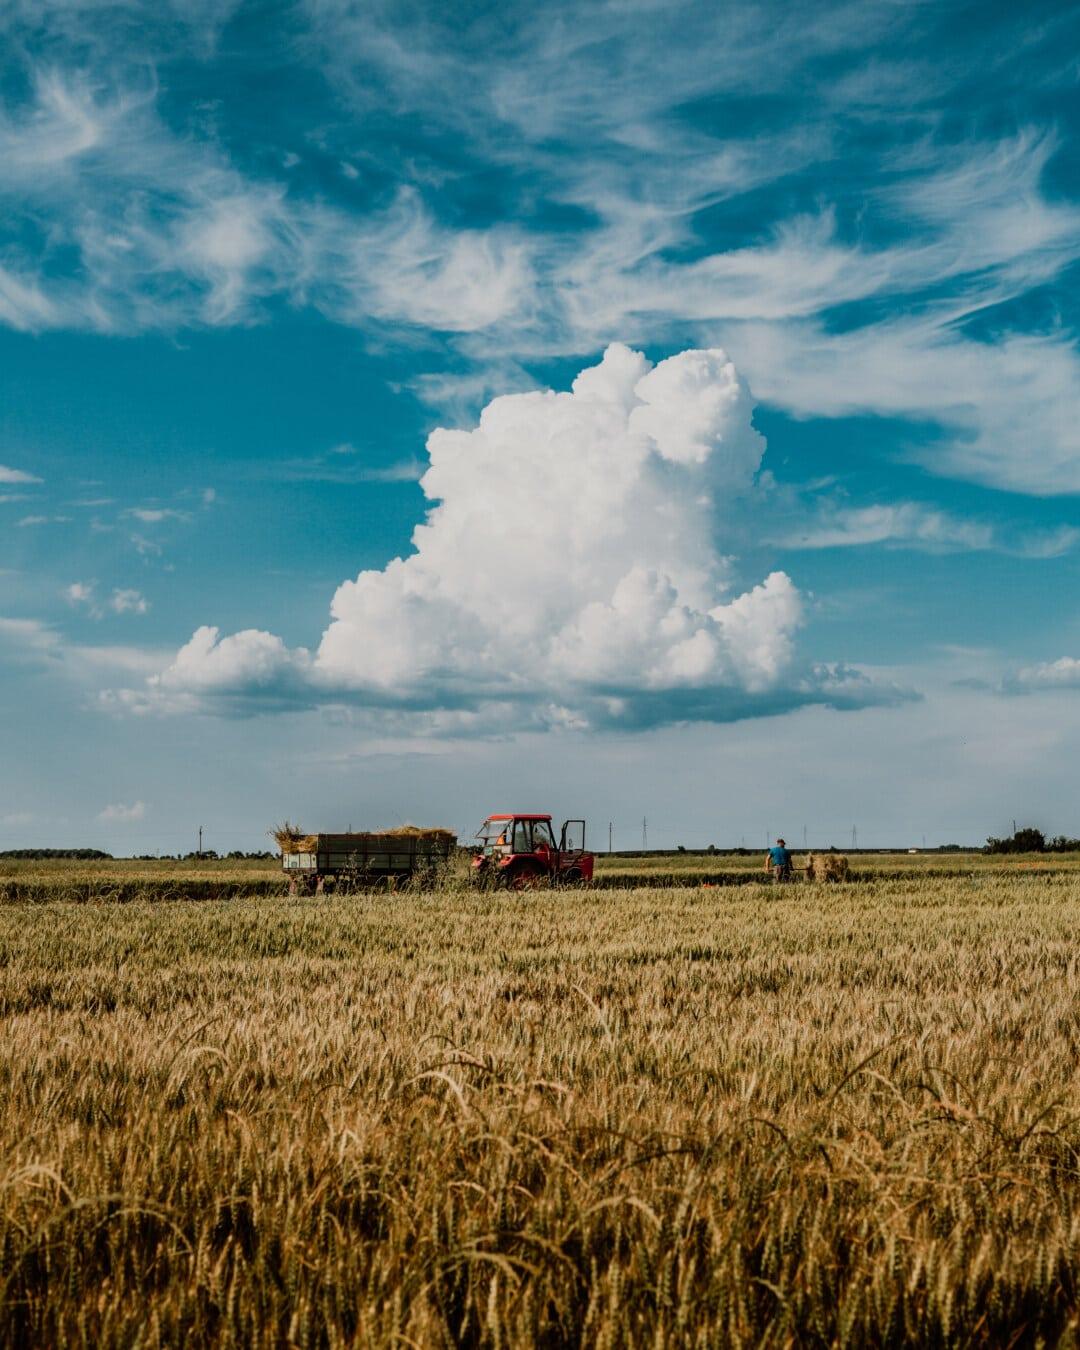 harvester, harvest, harvestman, summer season, wheatfield, cereal, wheat, machine, vehicle, tractor